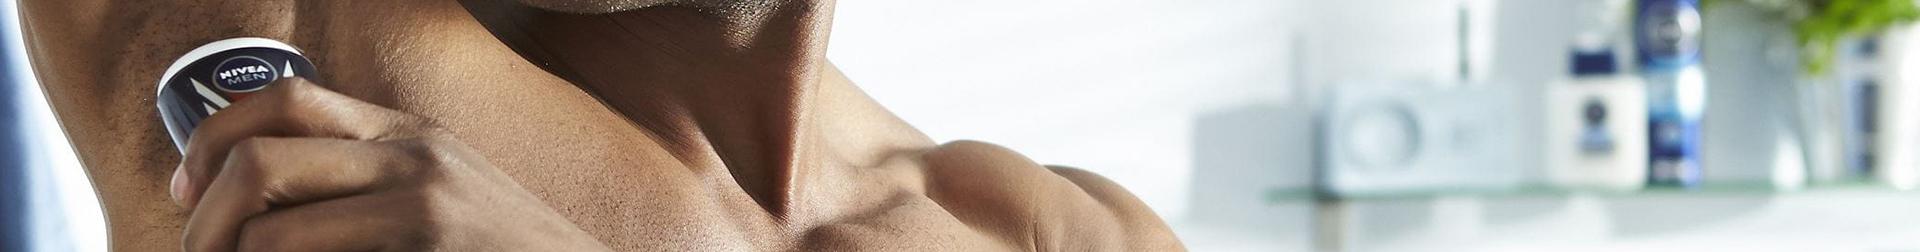 Deodorant Sticks | Buy Best Deodorant Sticks For Unisex | Aromacraze.com